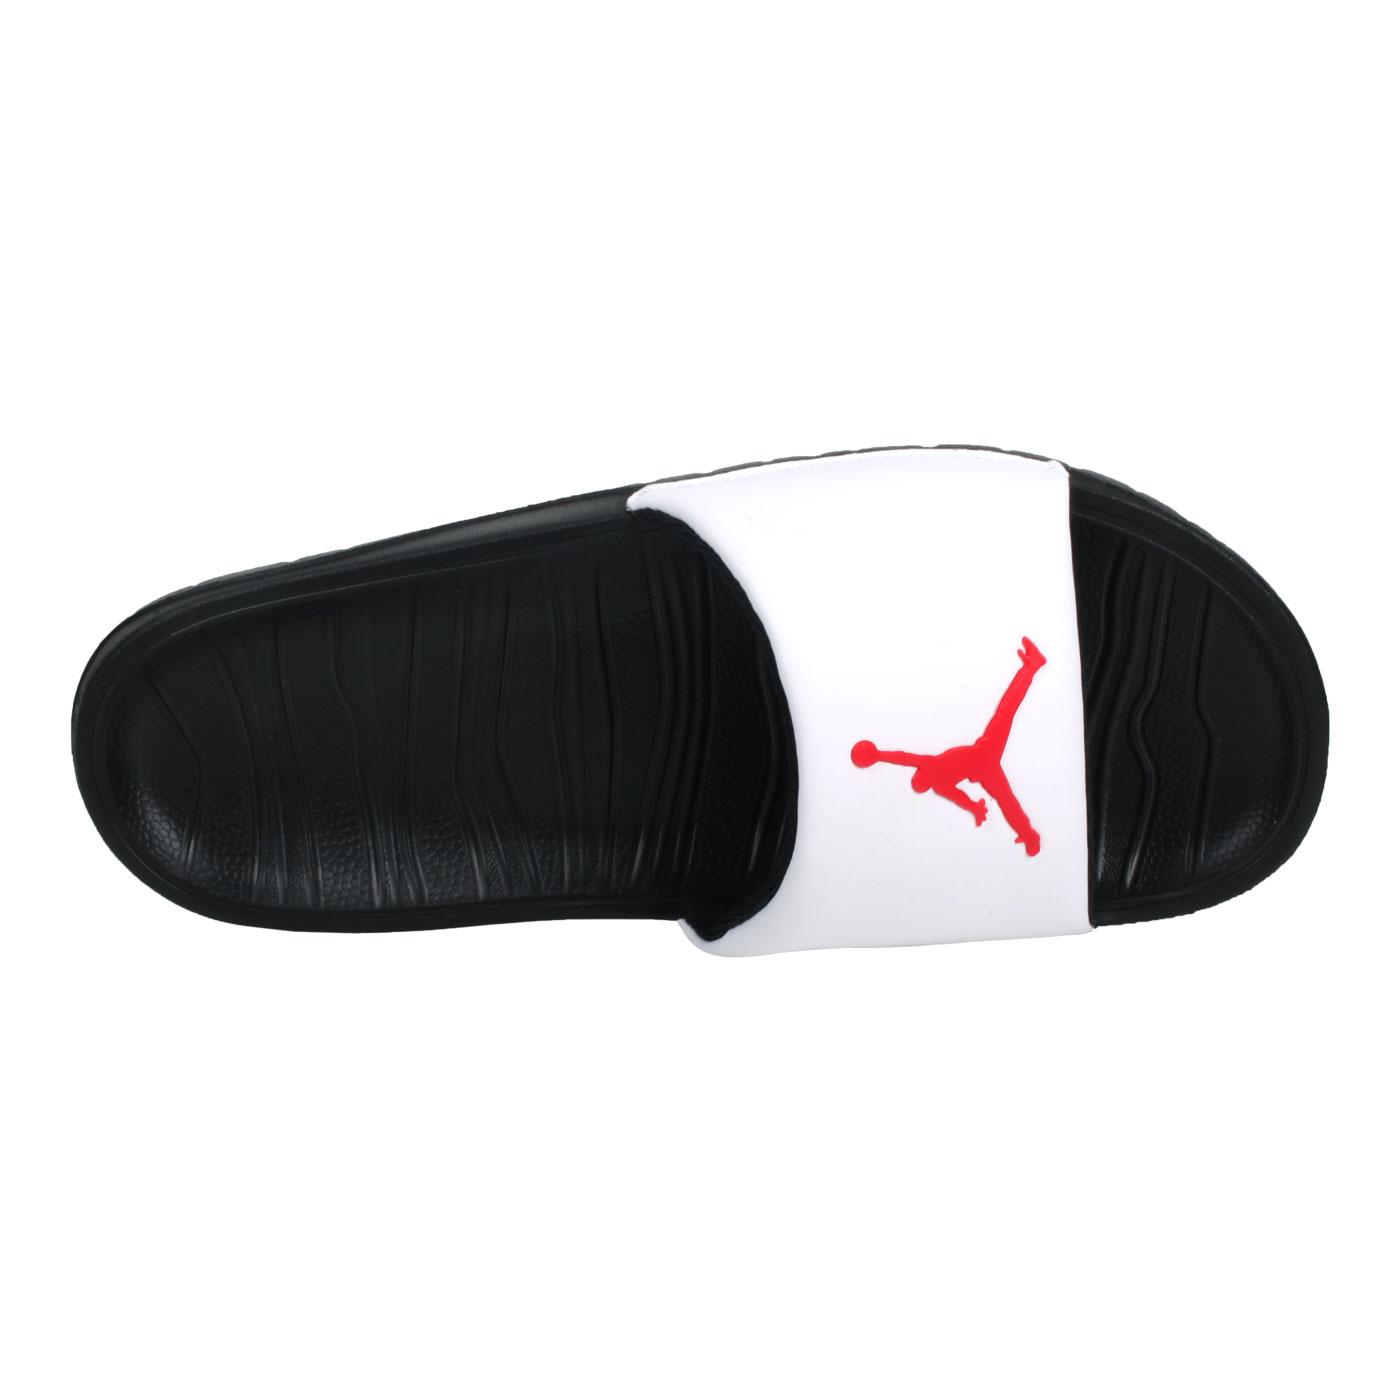 NIKE 男款拖鞋JORDAN  @BREAK SLIDE@AR6374016 - 白紅黑